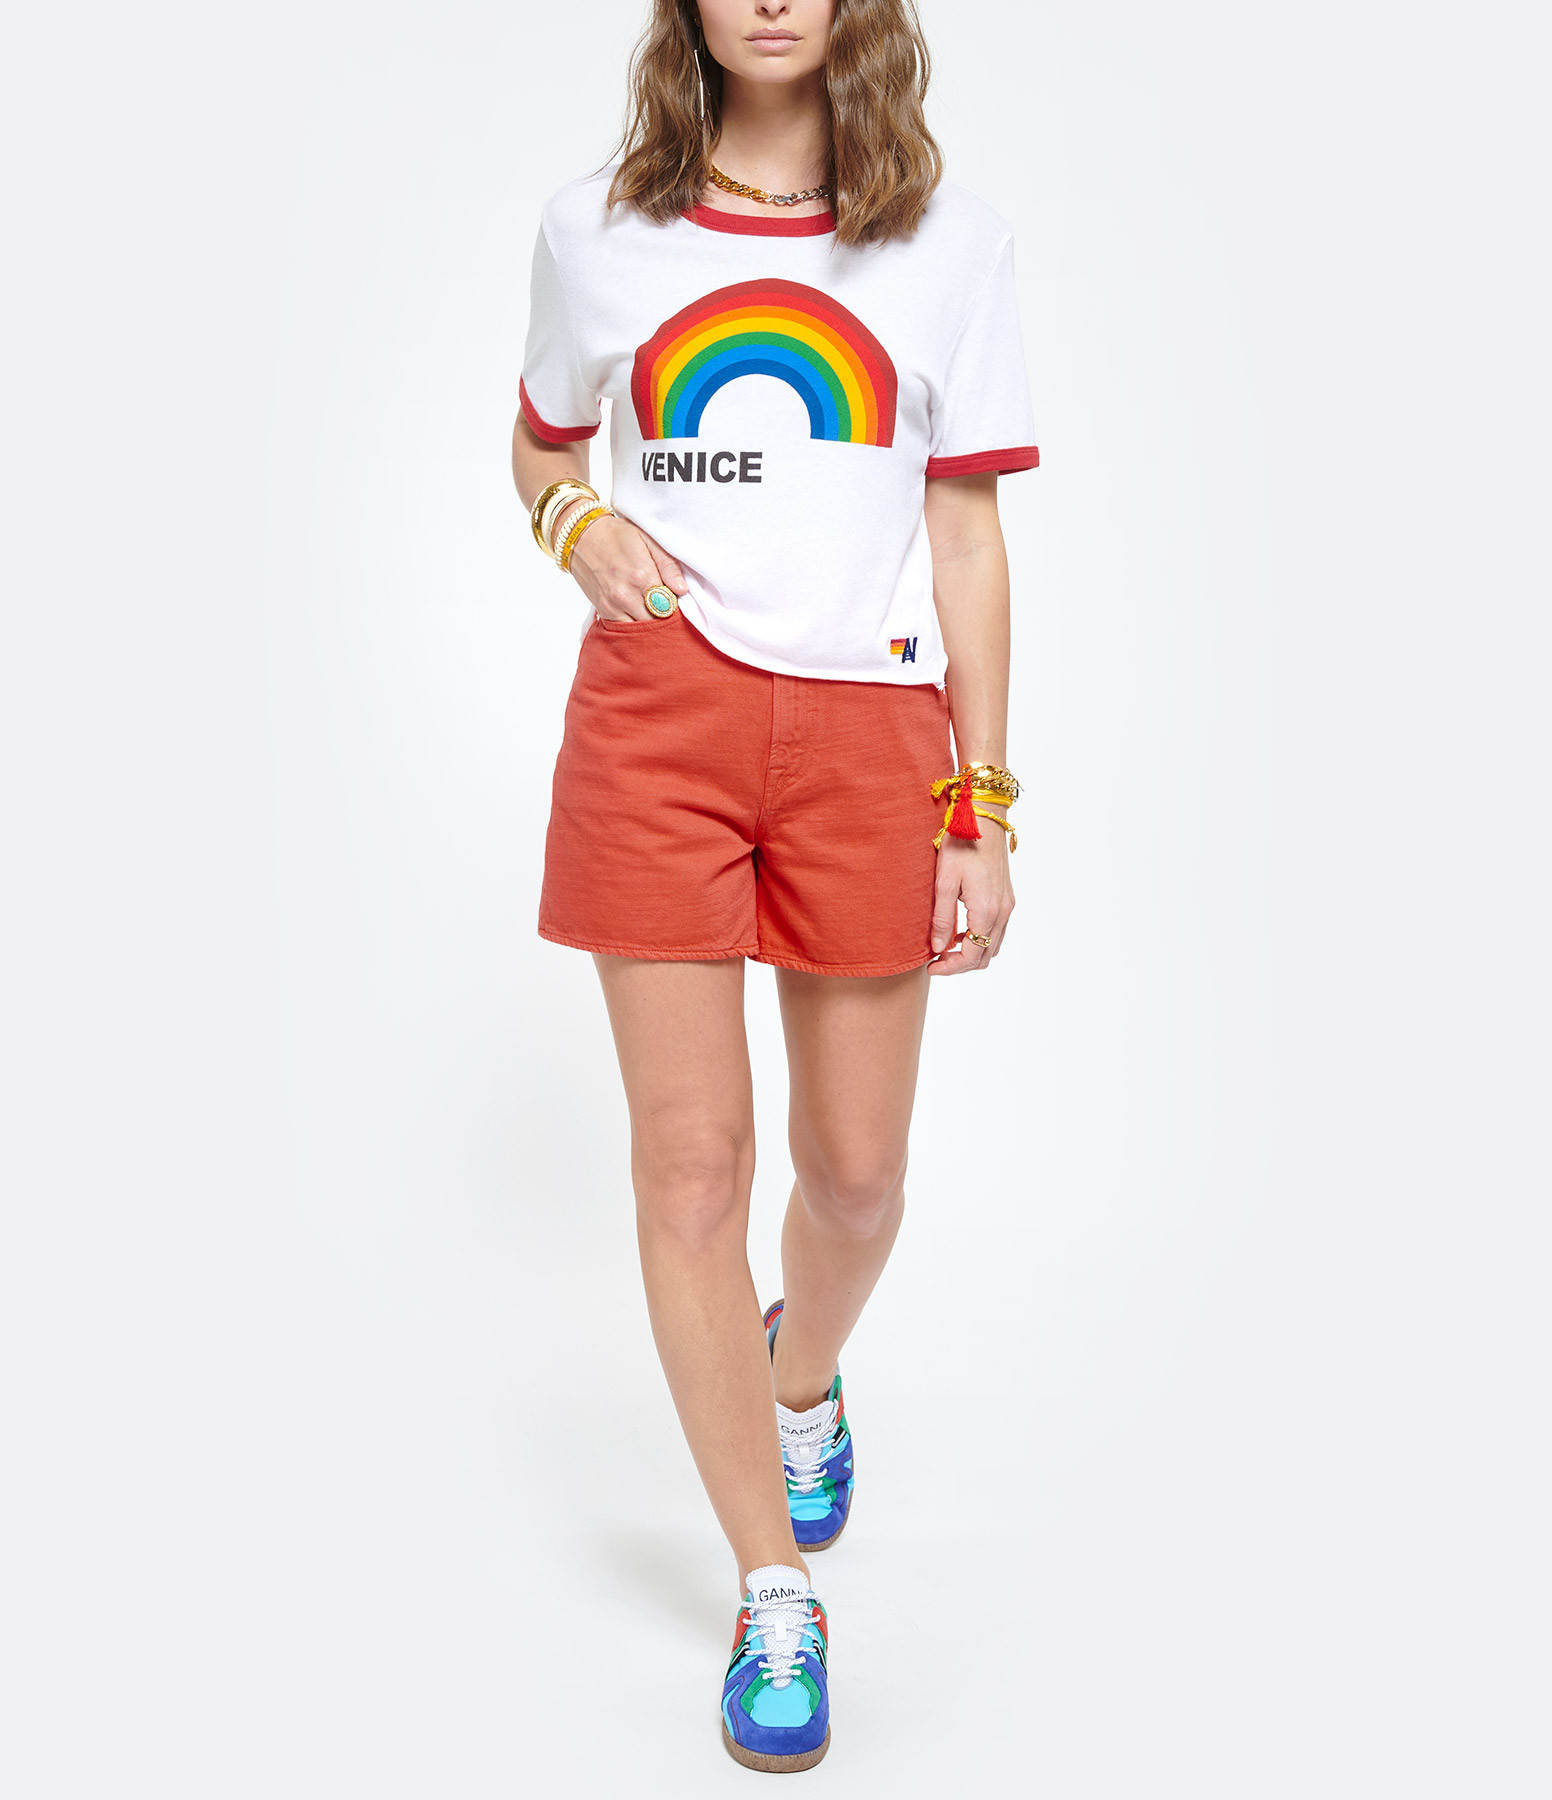 AVIATOR NATION - Tee-shirt Venice Blanc Rouge